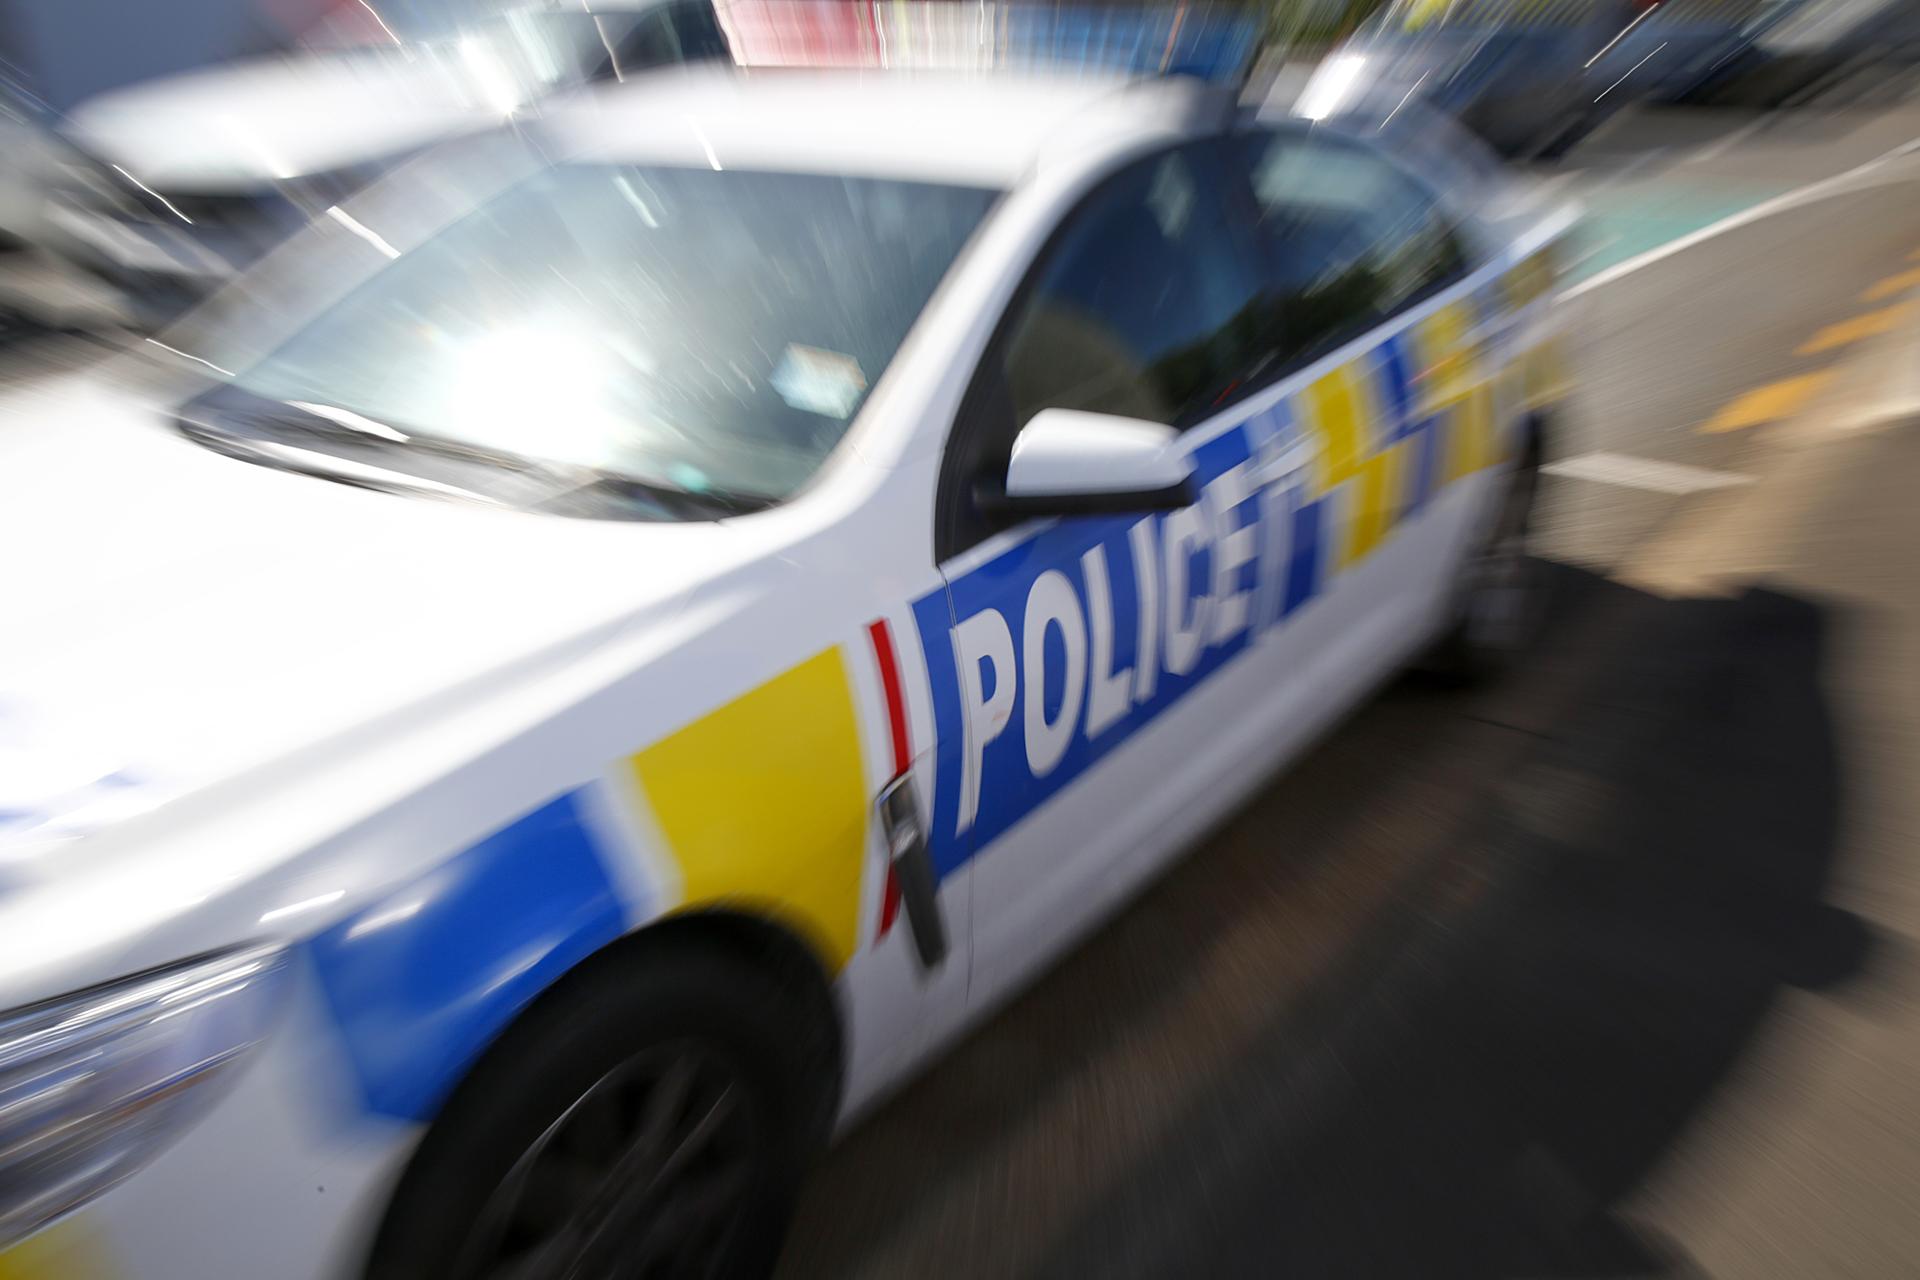 Police seek witnesses after man shot in Timaru